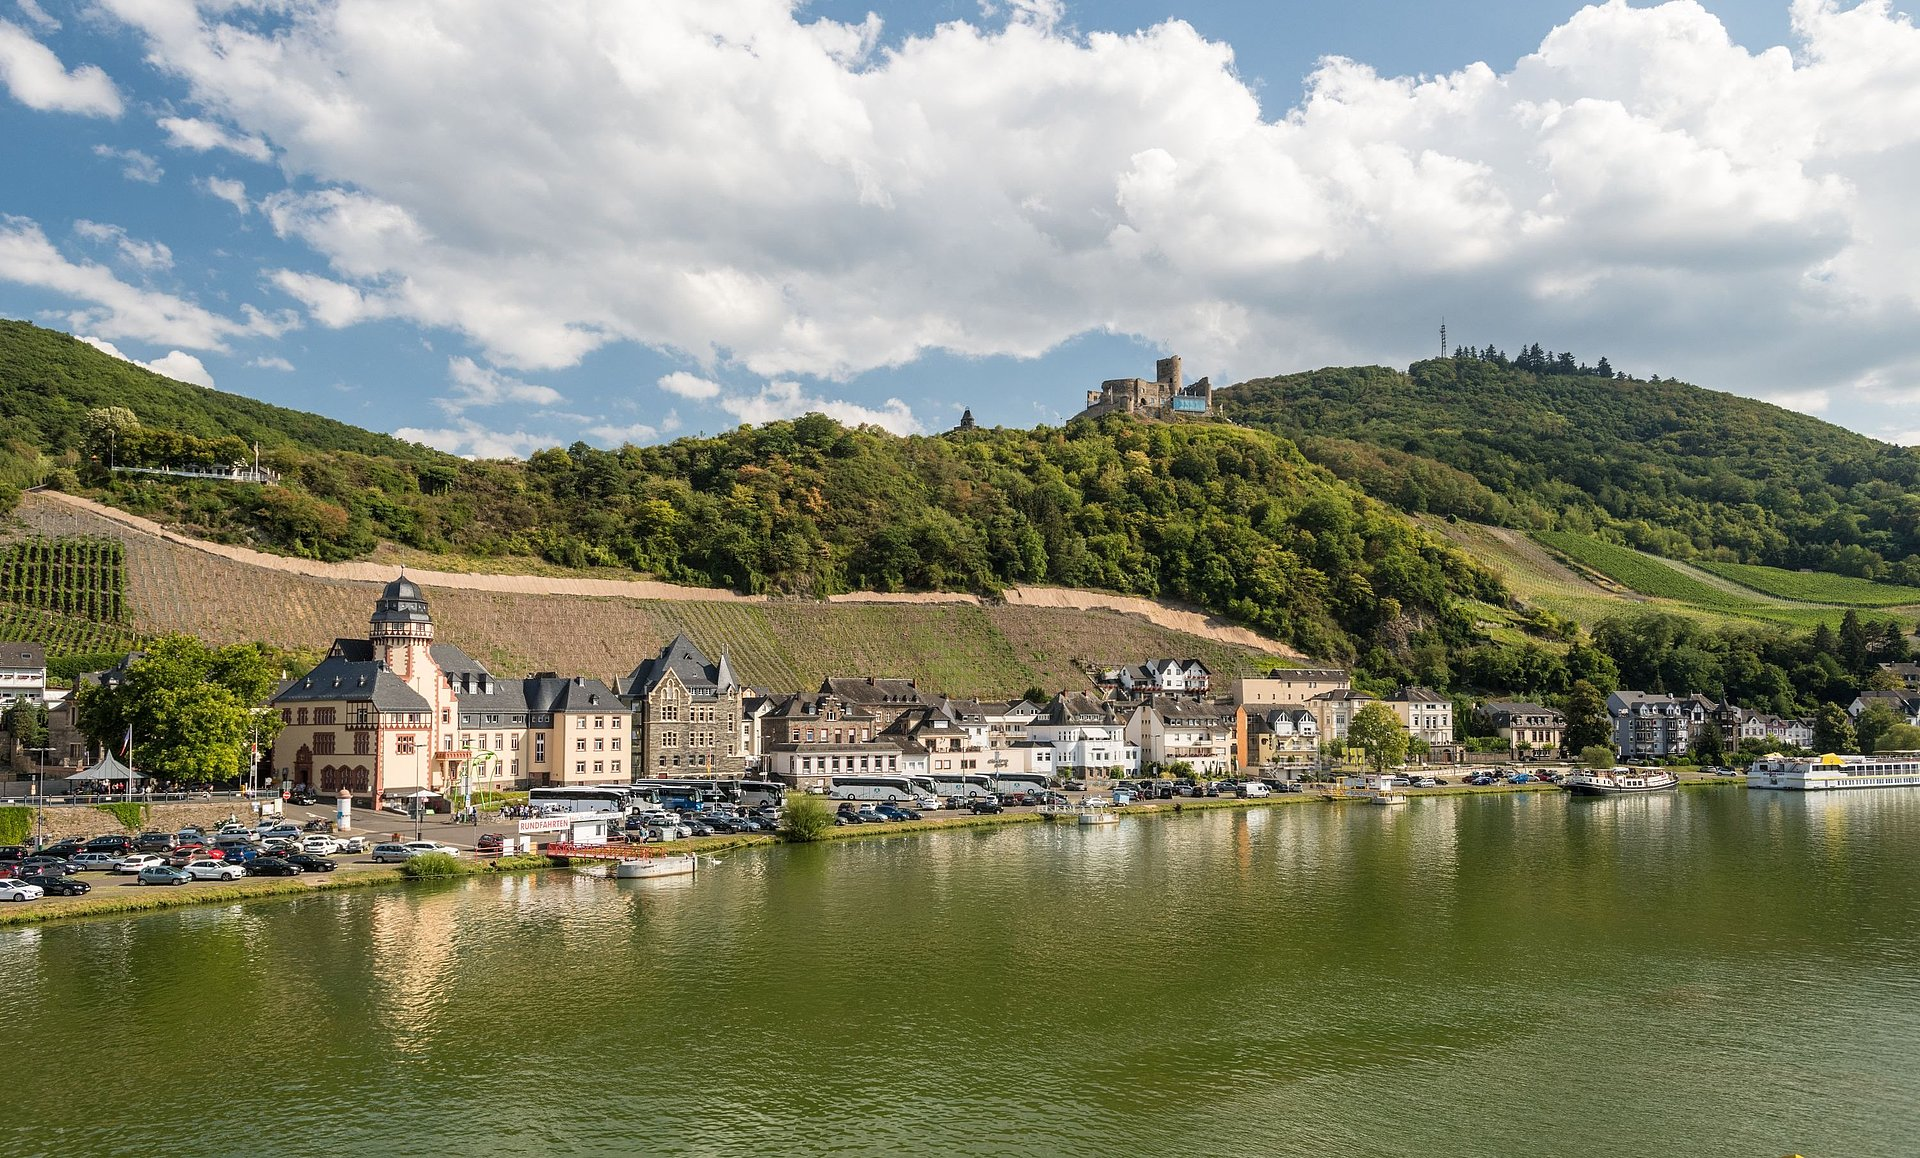 View of Landshut Castle at Bernkastel, Moselle